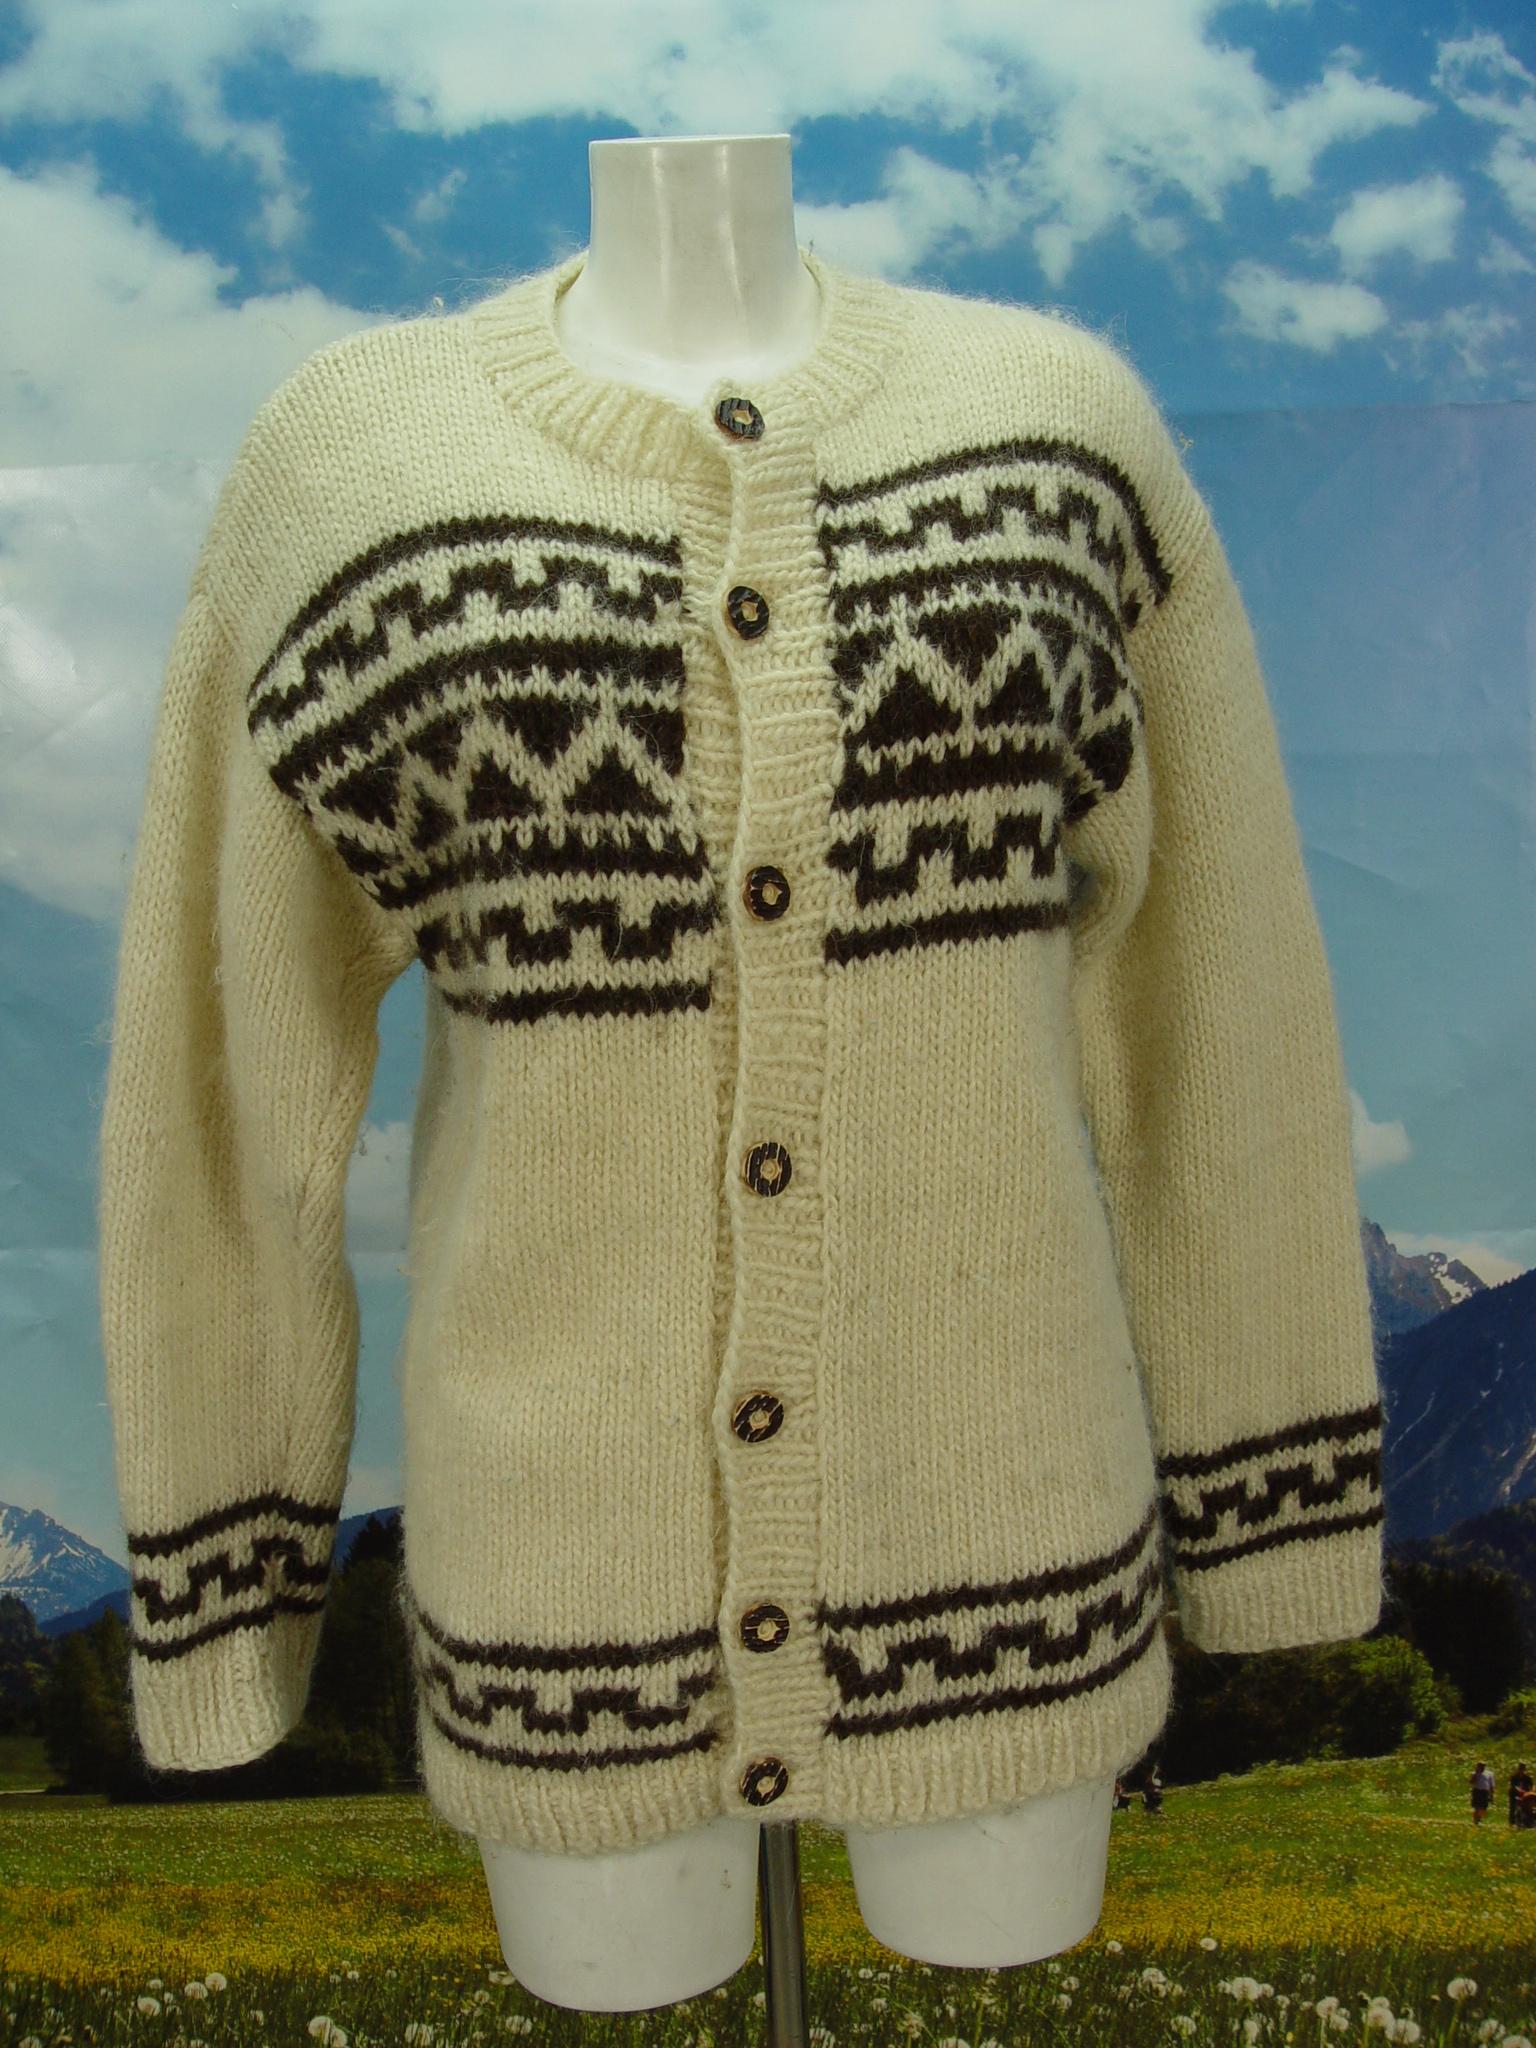 46670fa4fd50 Weiße Strickjacke aus Wolle, schöne Jacke, Janker Trachtenjacke Gr.54